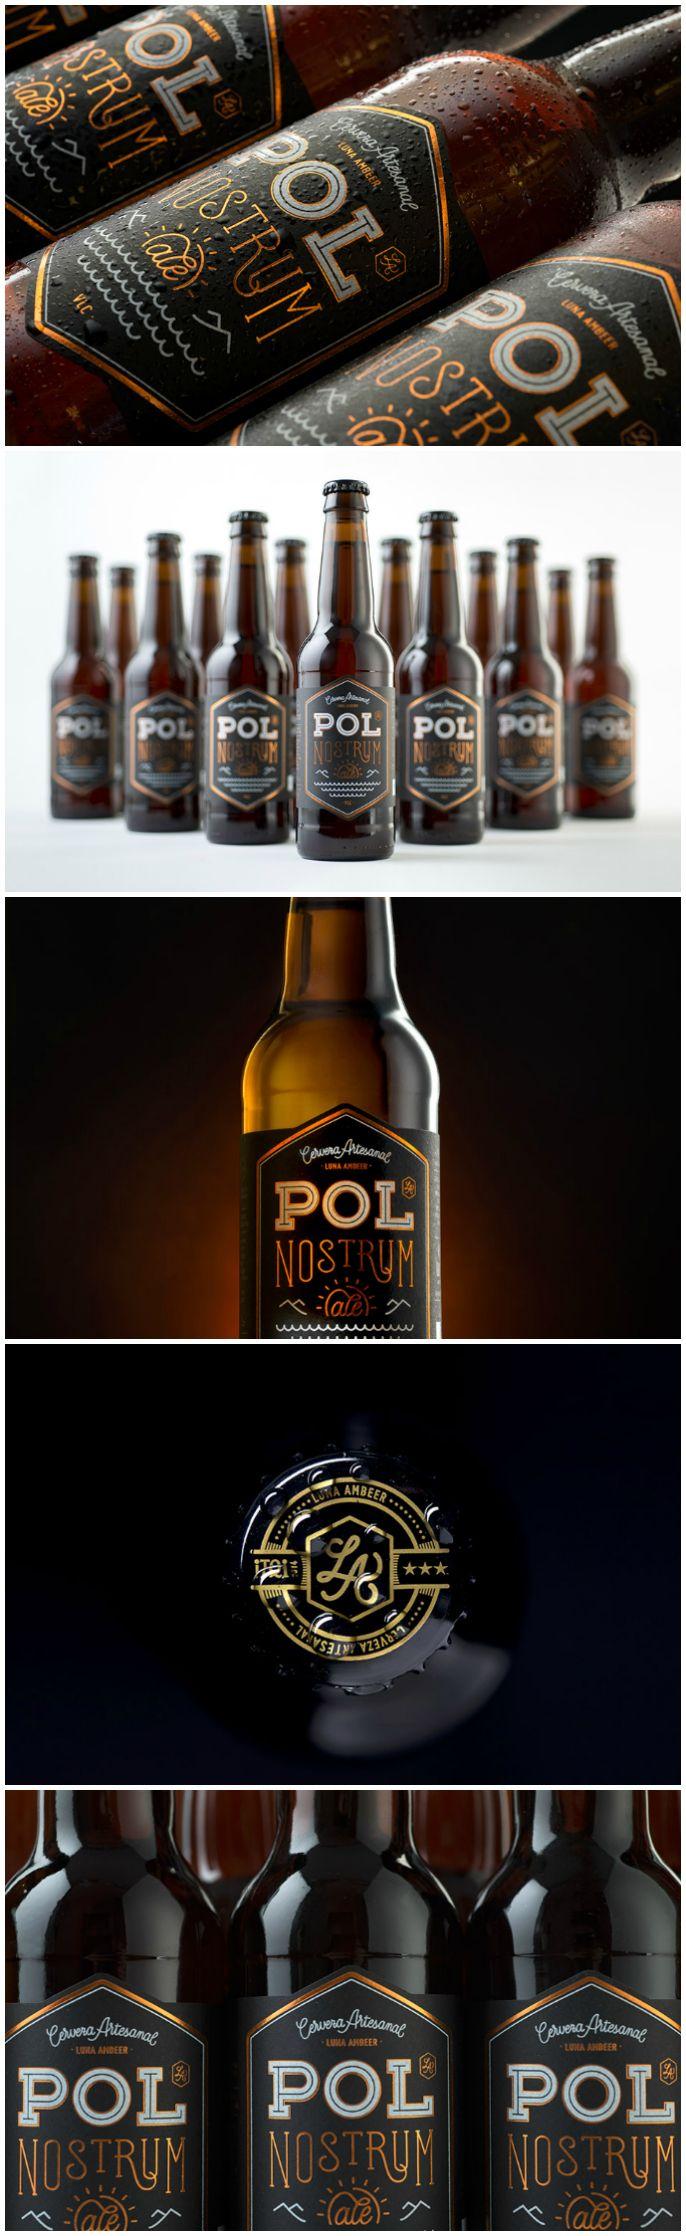 Packaging Design for Valencian, Spanish Artisan Craft Beer  Design Agency:Pixelarte - Diseño & Creatividad Brand / Project Name:Pol Nostrum Ale Location:Spain Category: #beer #drink